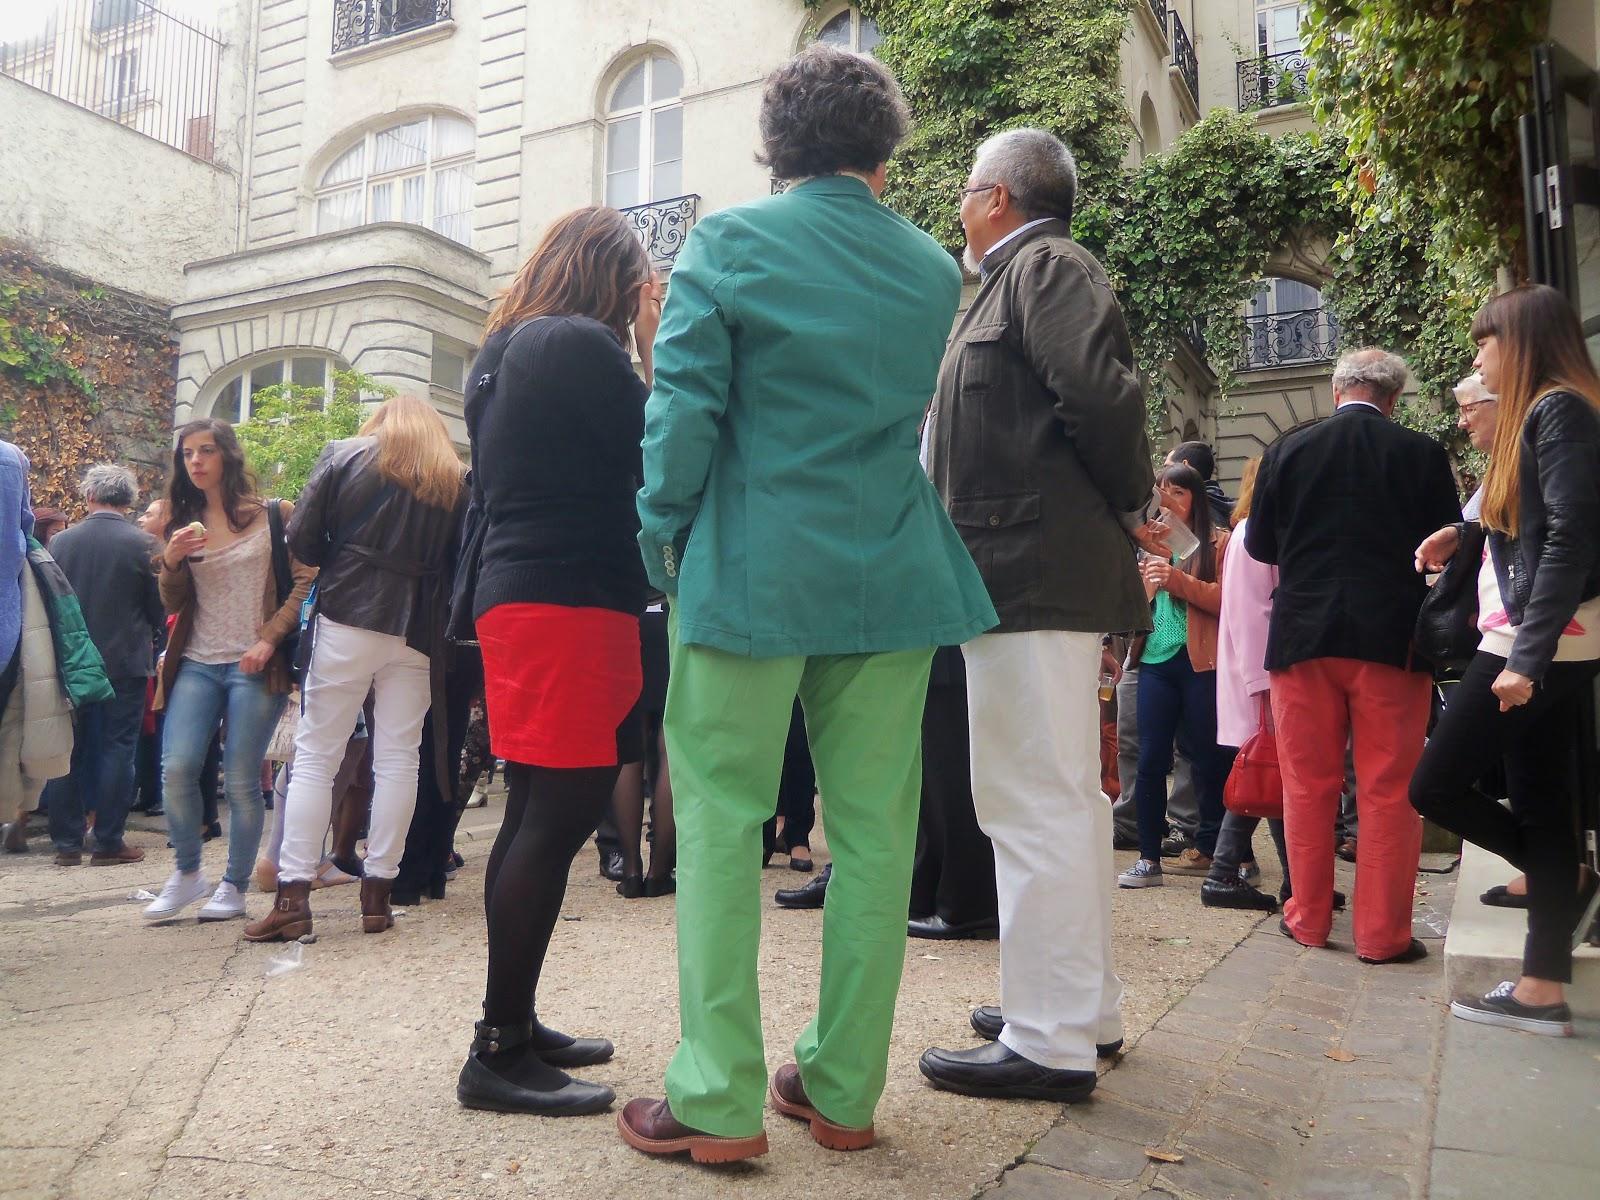 25 de mayo embajada argentina de paris